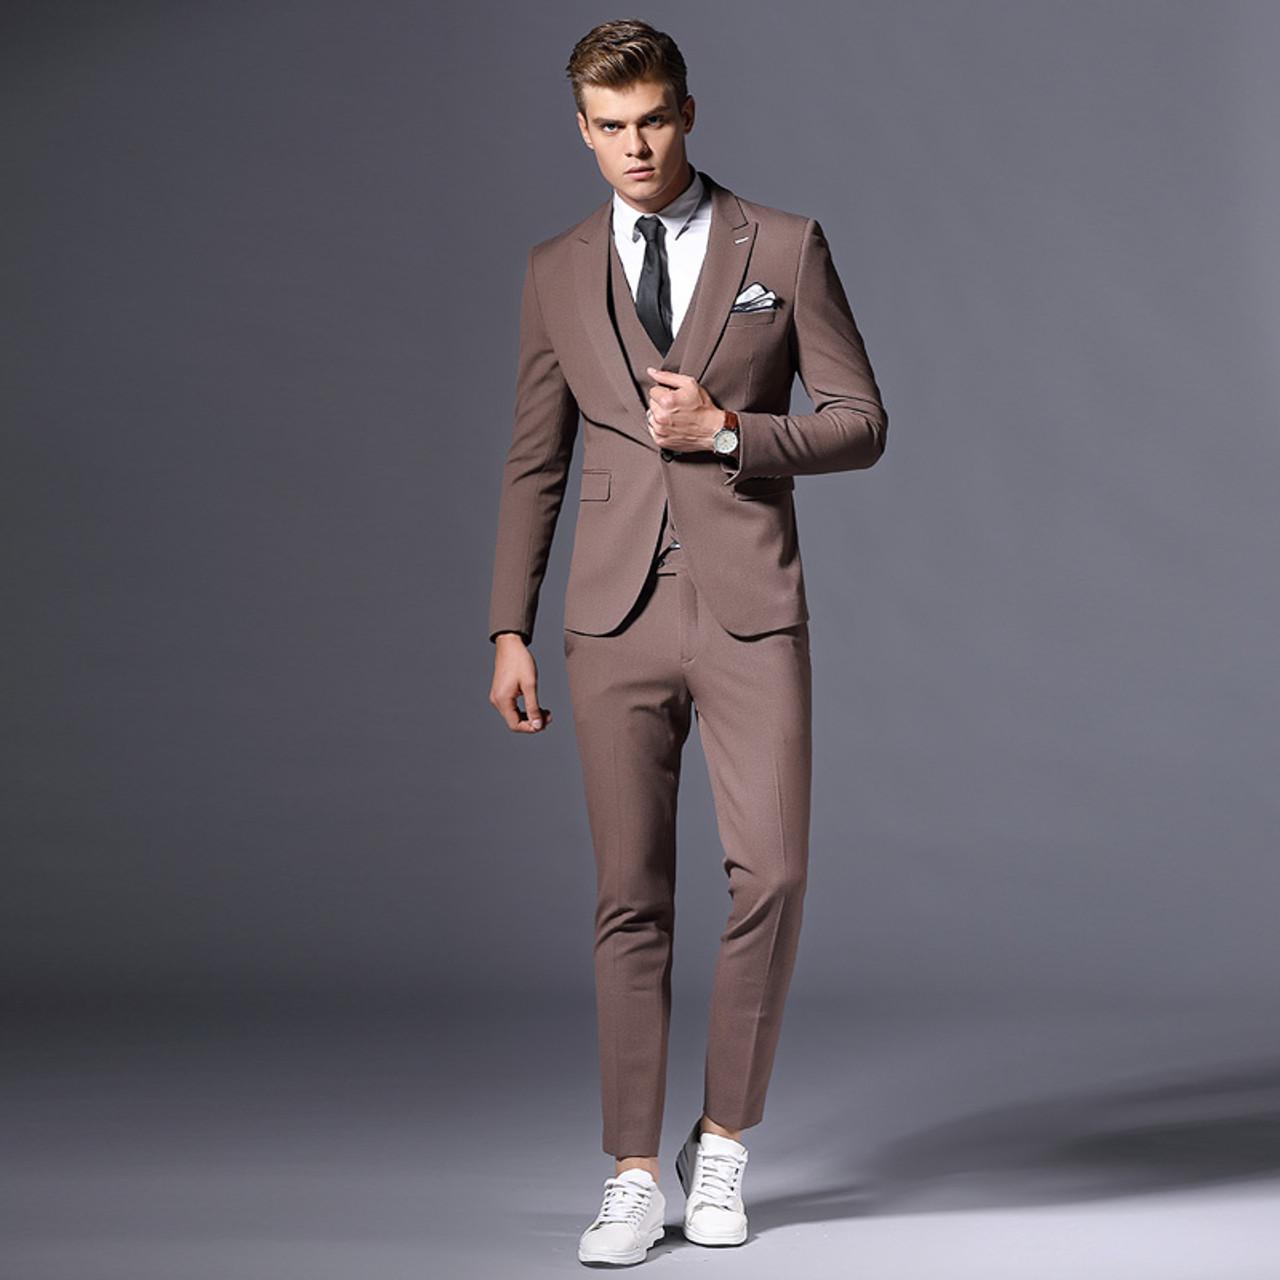 253cf145894 ... Sale Brand Mens Suit Jacket Formal Business Blazer Men Groom Three  Pieces Slim Fit Party Clothing ...